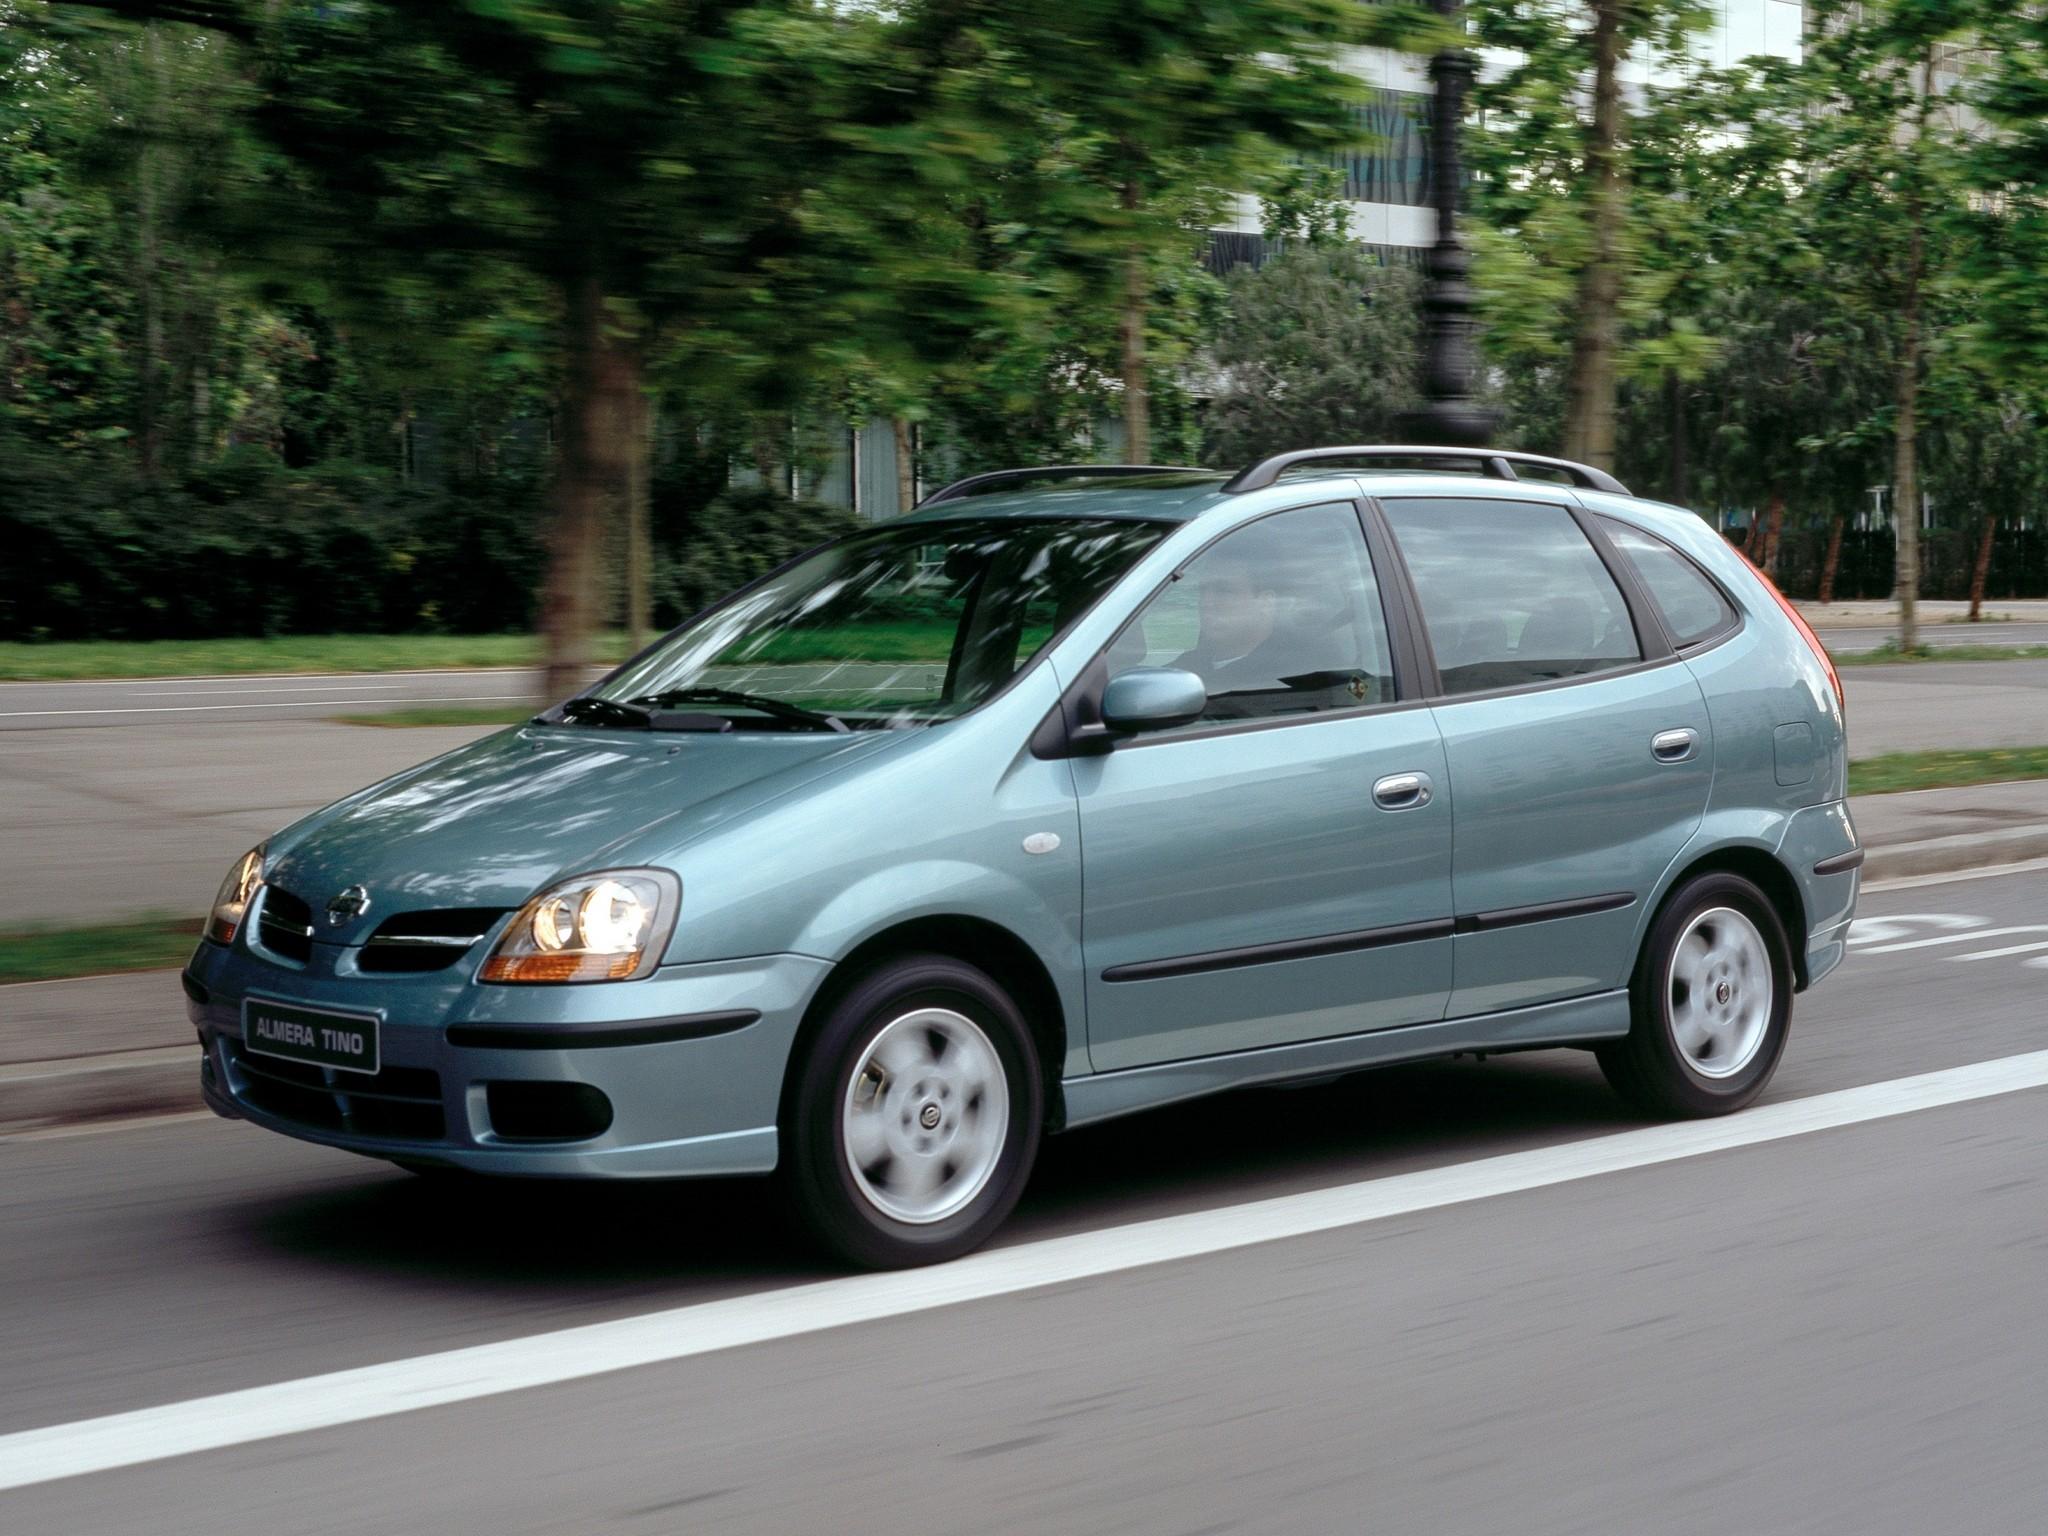 Nissan Almera Tino I 2000 - 2003 Compact MPV #5